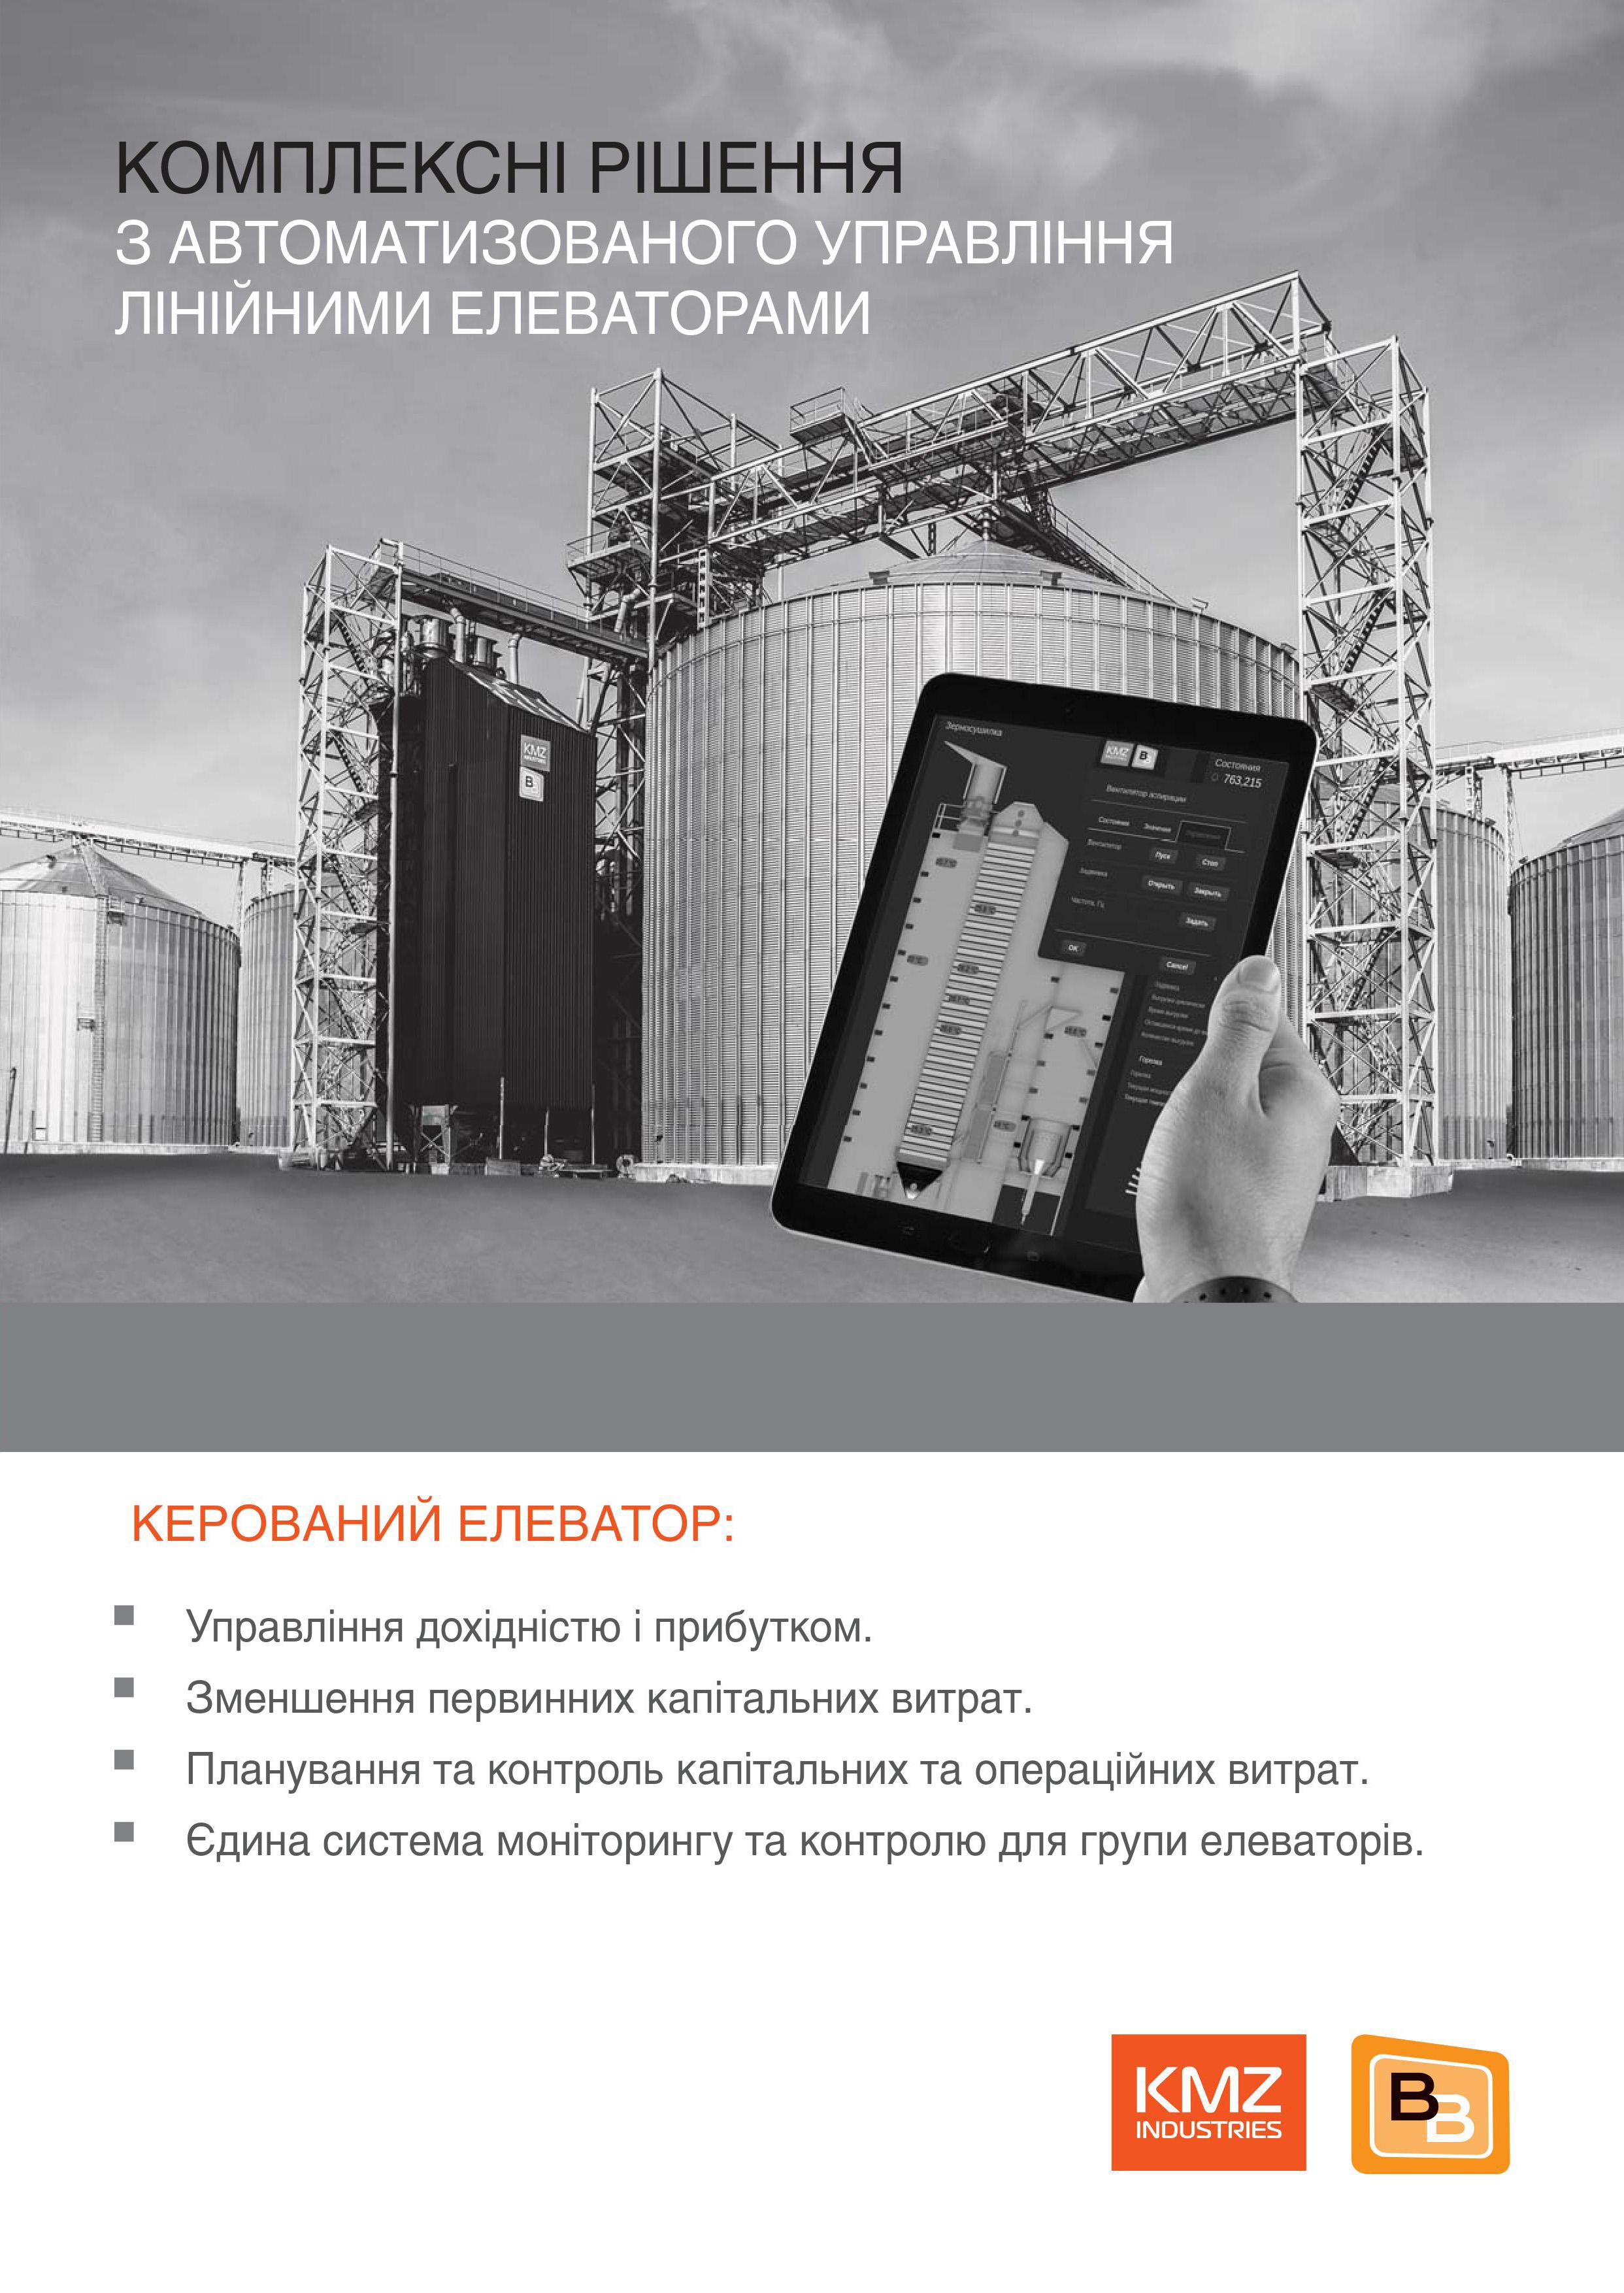 Каталог KMZ Industries